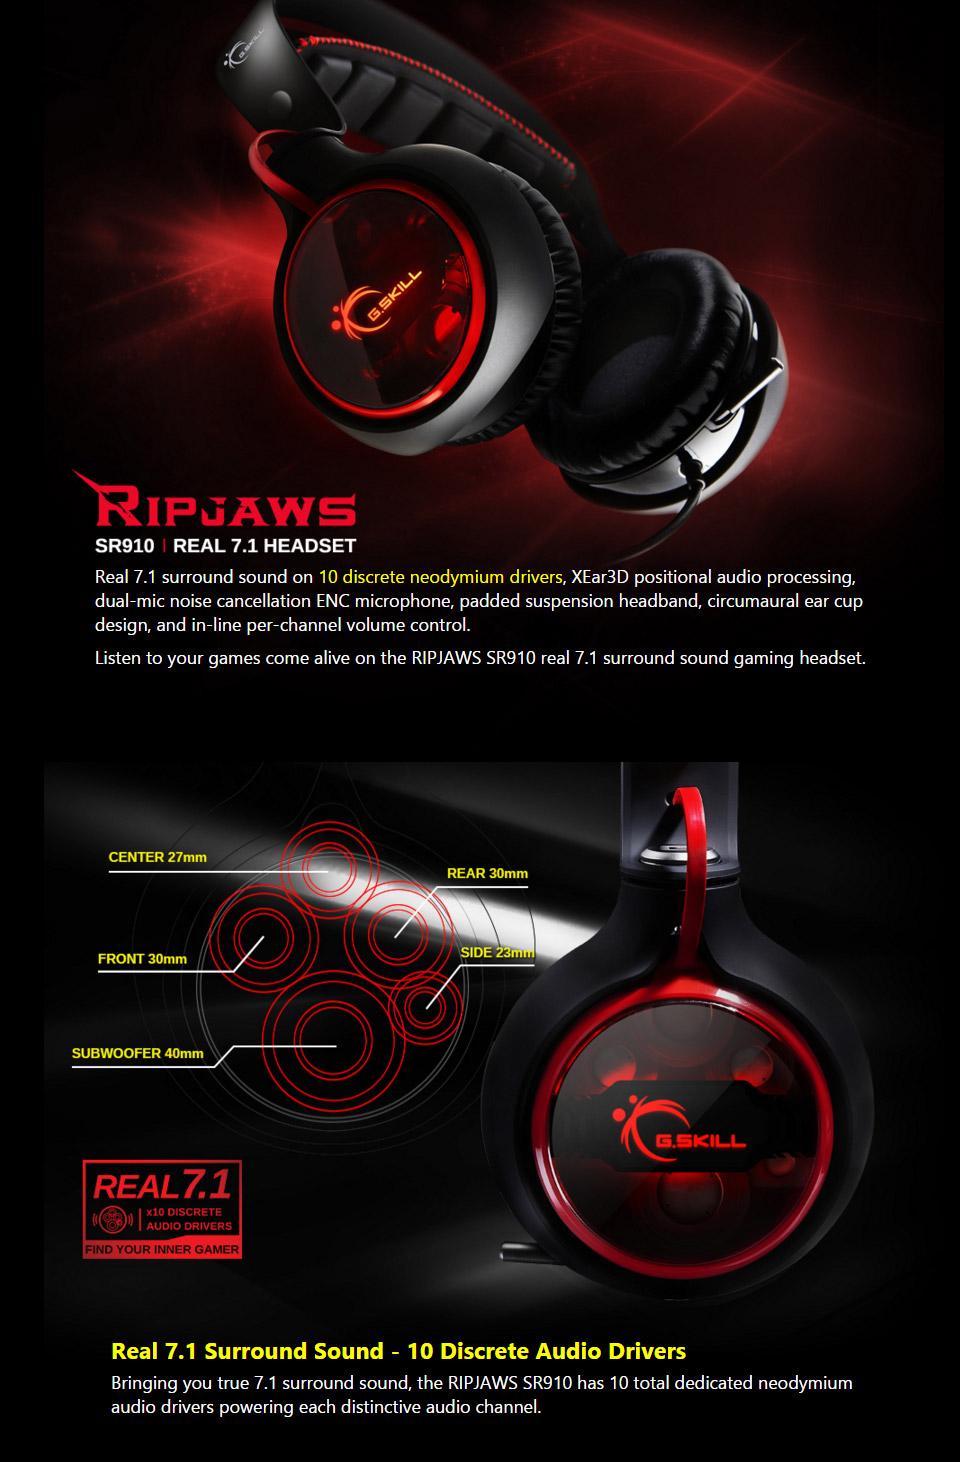 G Skill Ripjaws SR910 Real 7 1 USB Headset [GS-GH-D71NRE